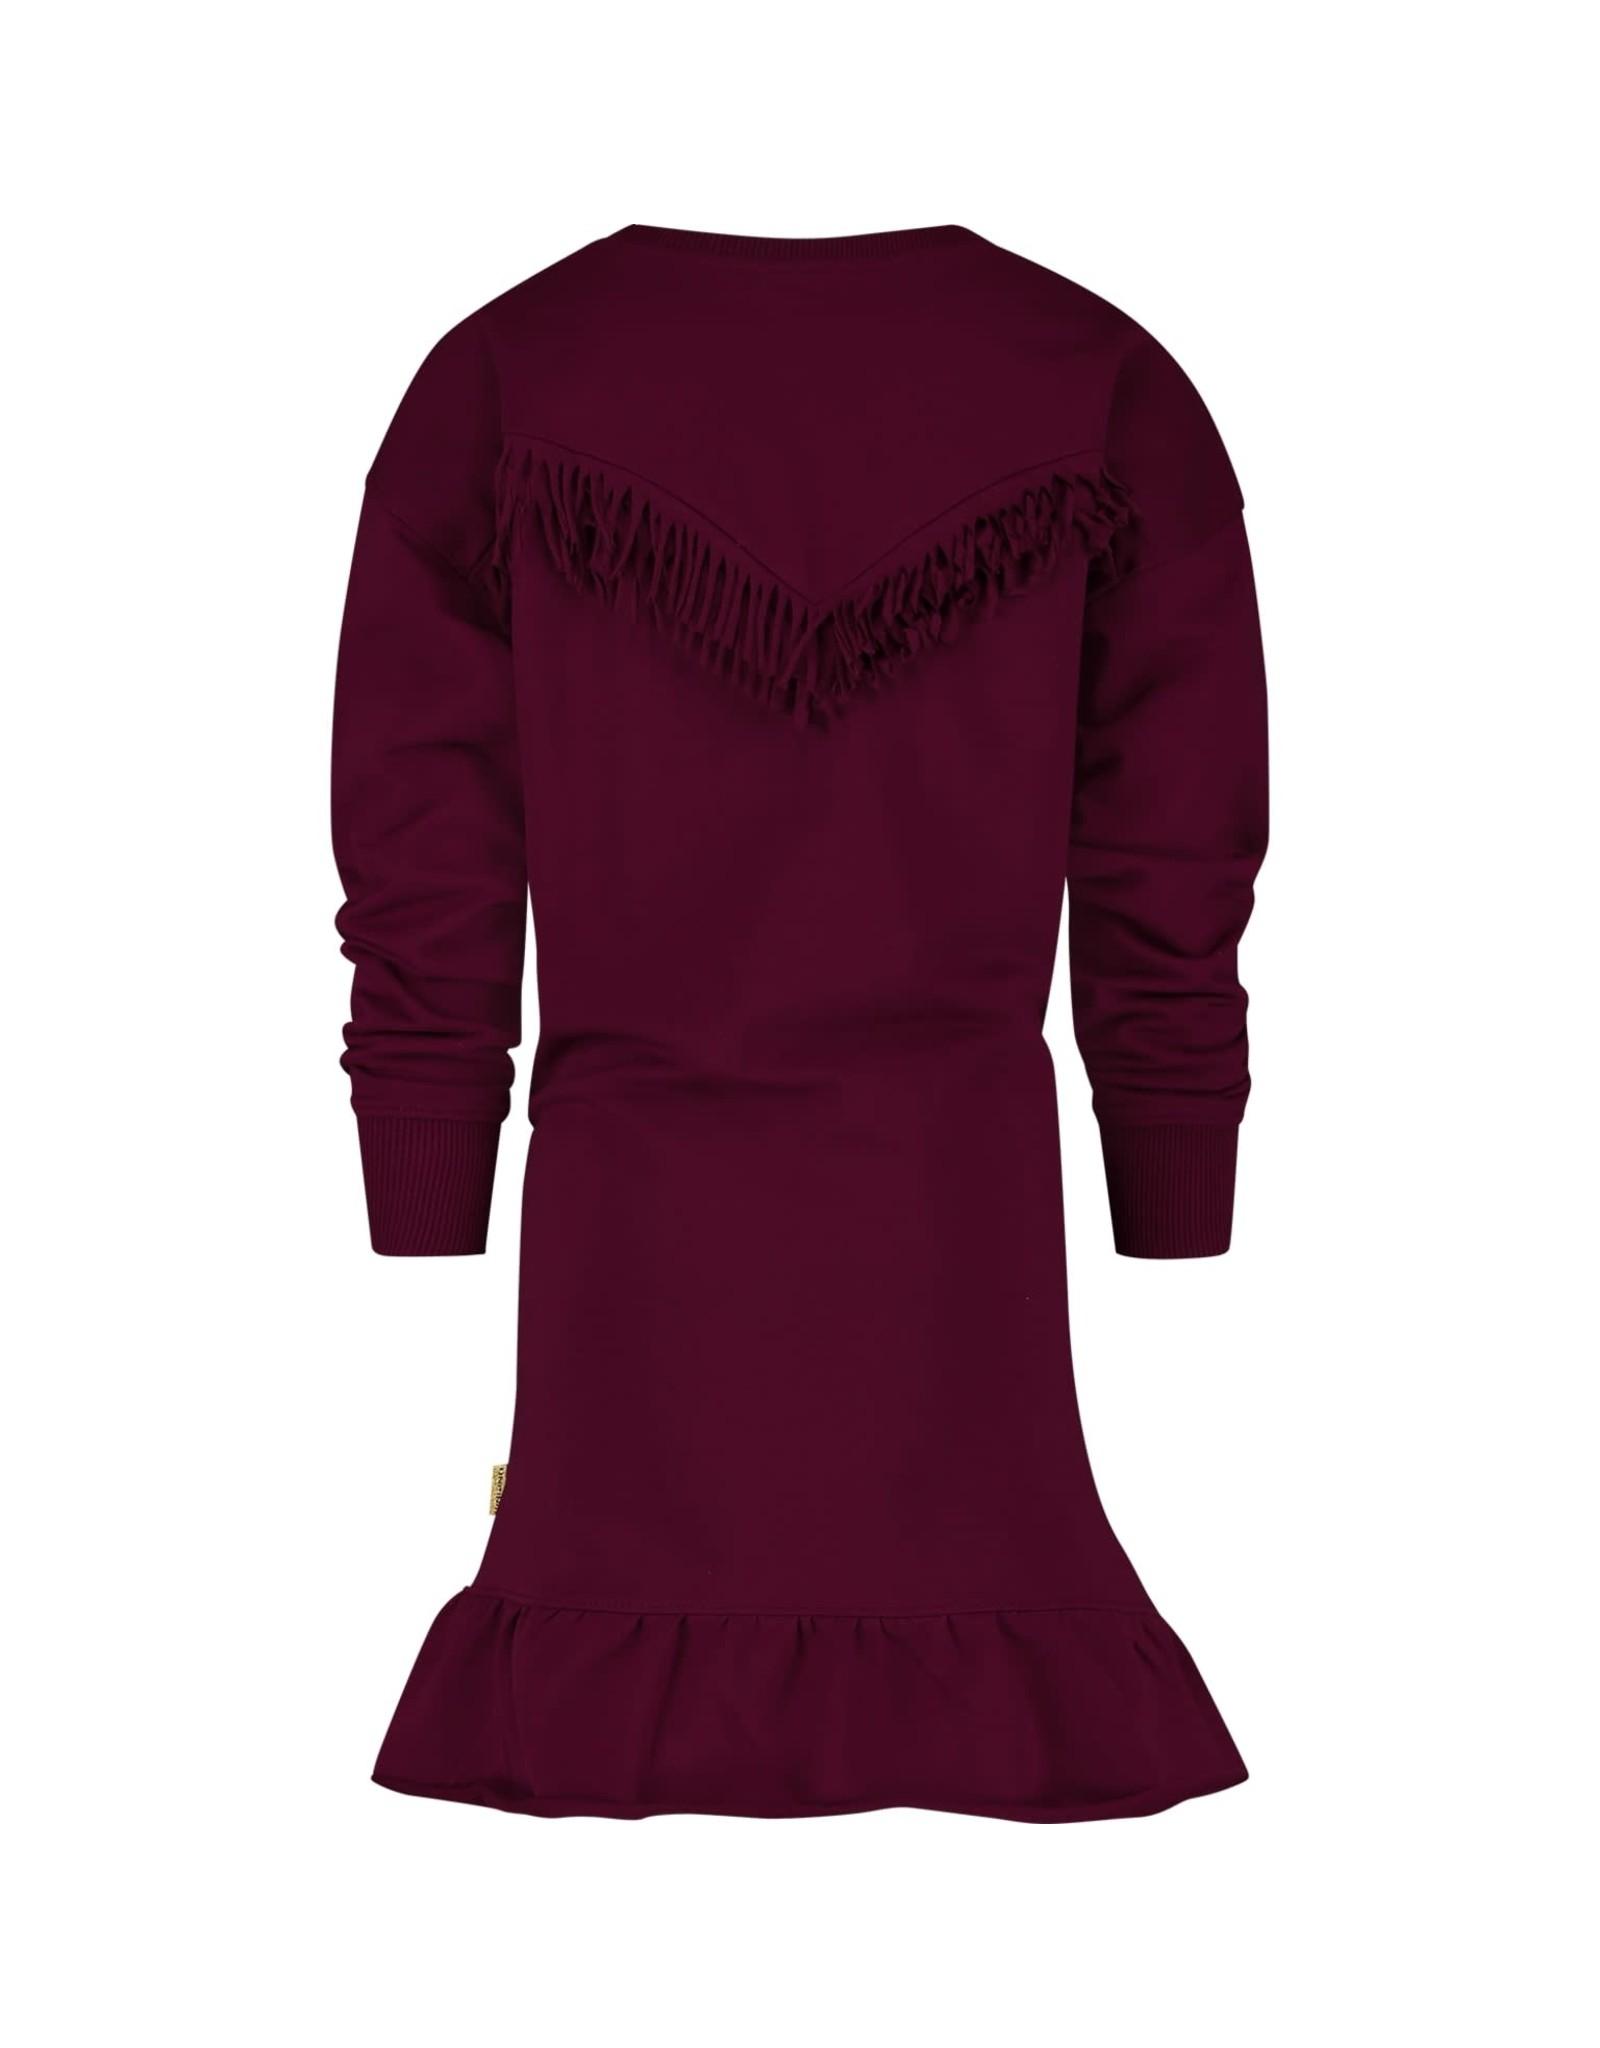 Vingino Vingino meiden jurk Patrieske Bordeaux Red